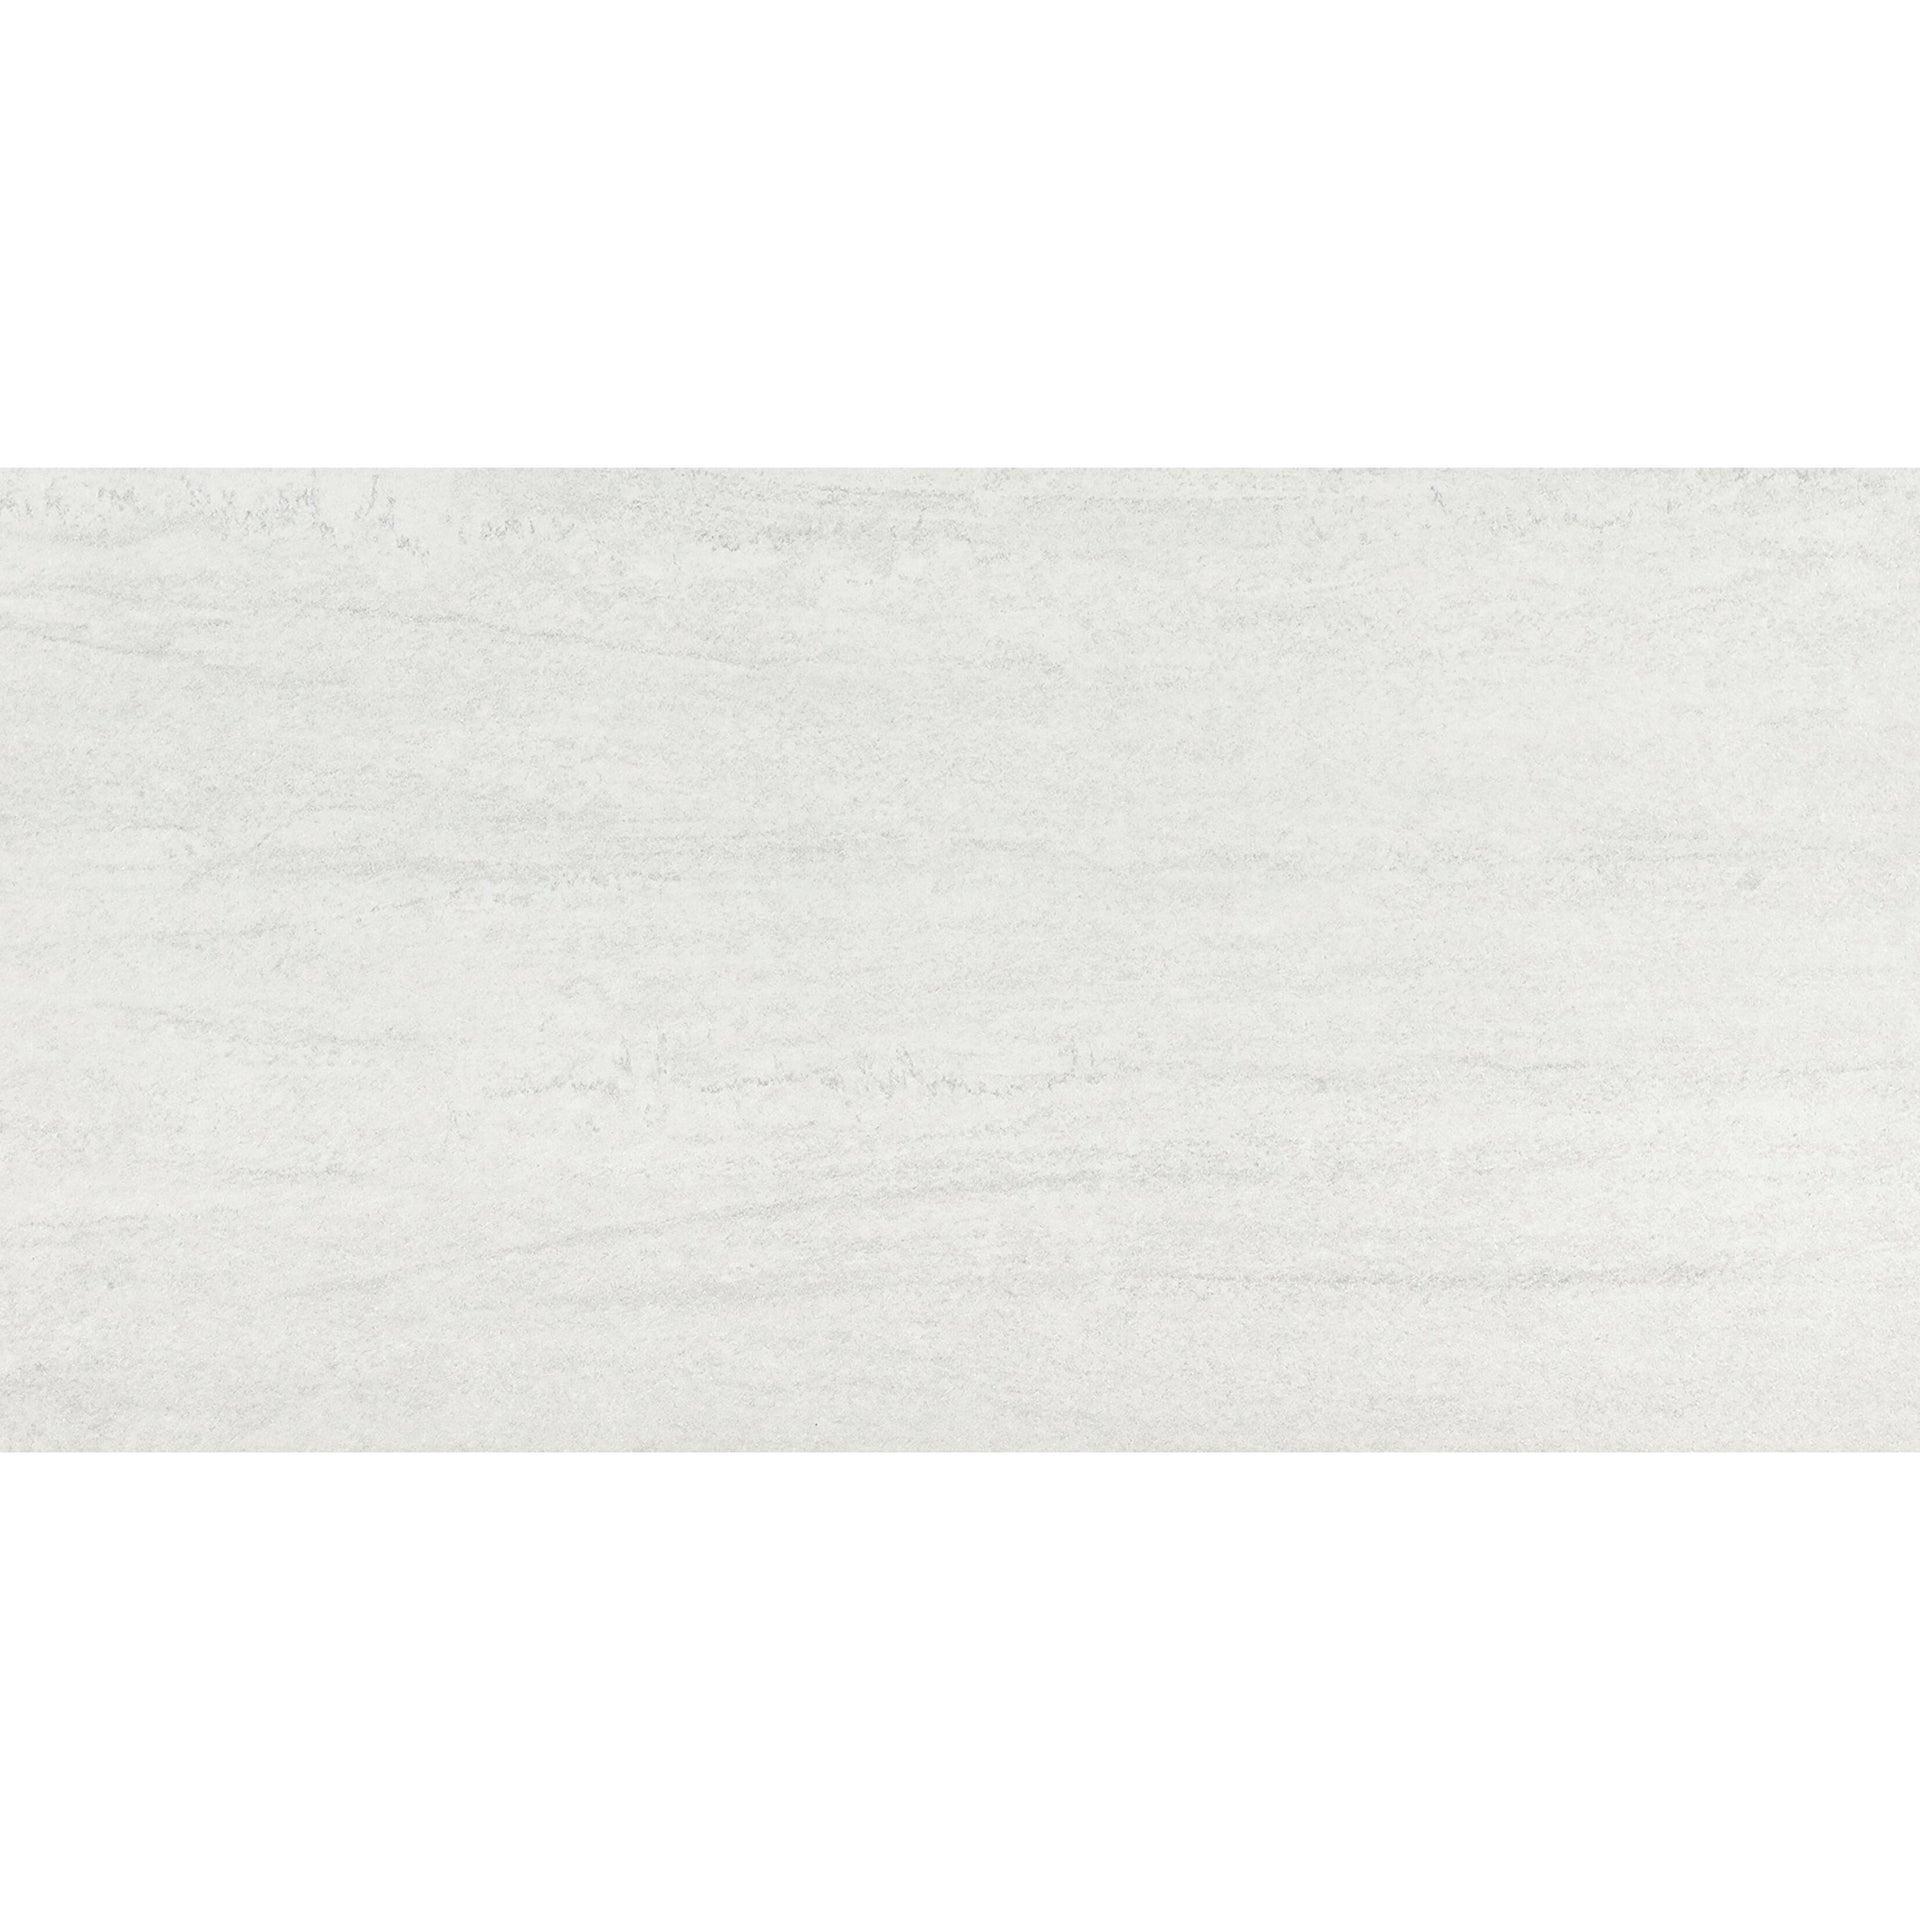 Piastrella Karin 45 x 90 cm sp. 10 mm PEI 4/5 bianco - 2